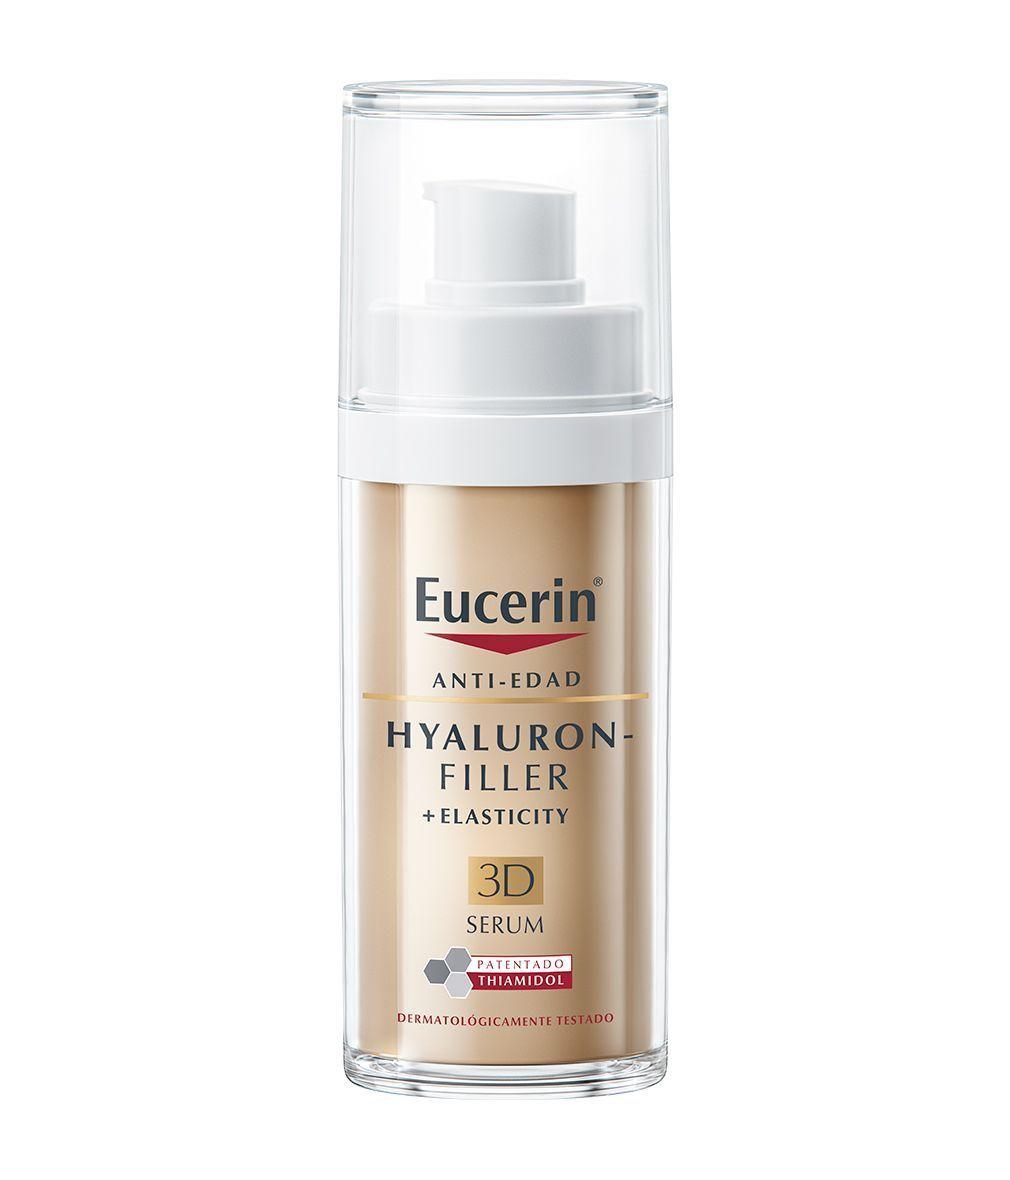 Eucerin 3D Serum Hyaluron-Filler + Elasticity